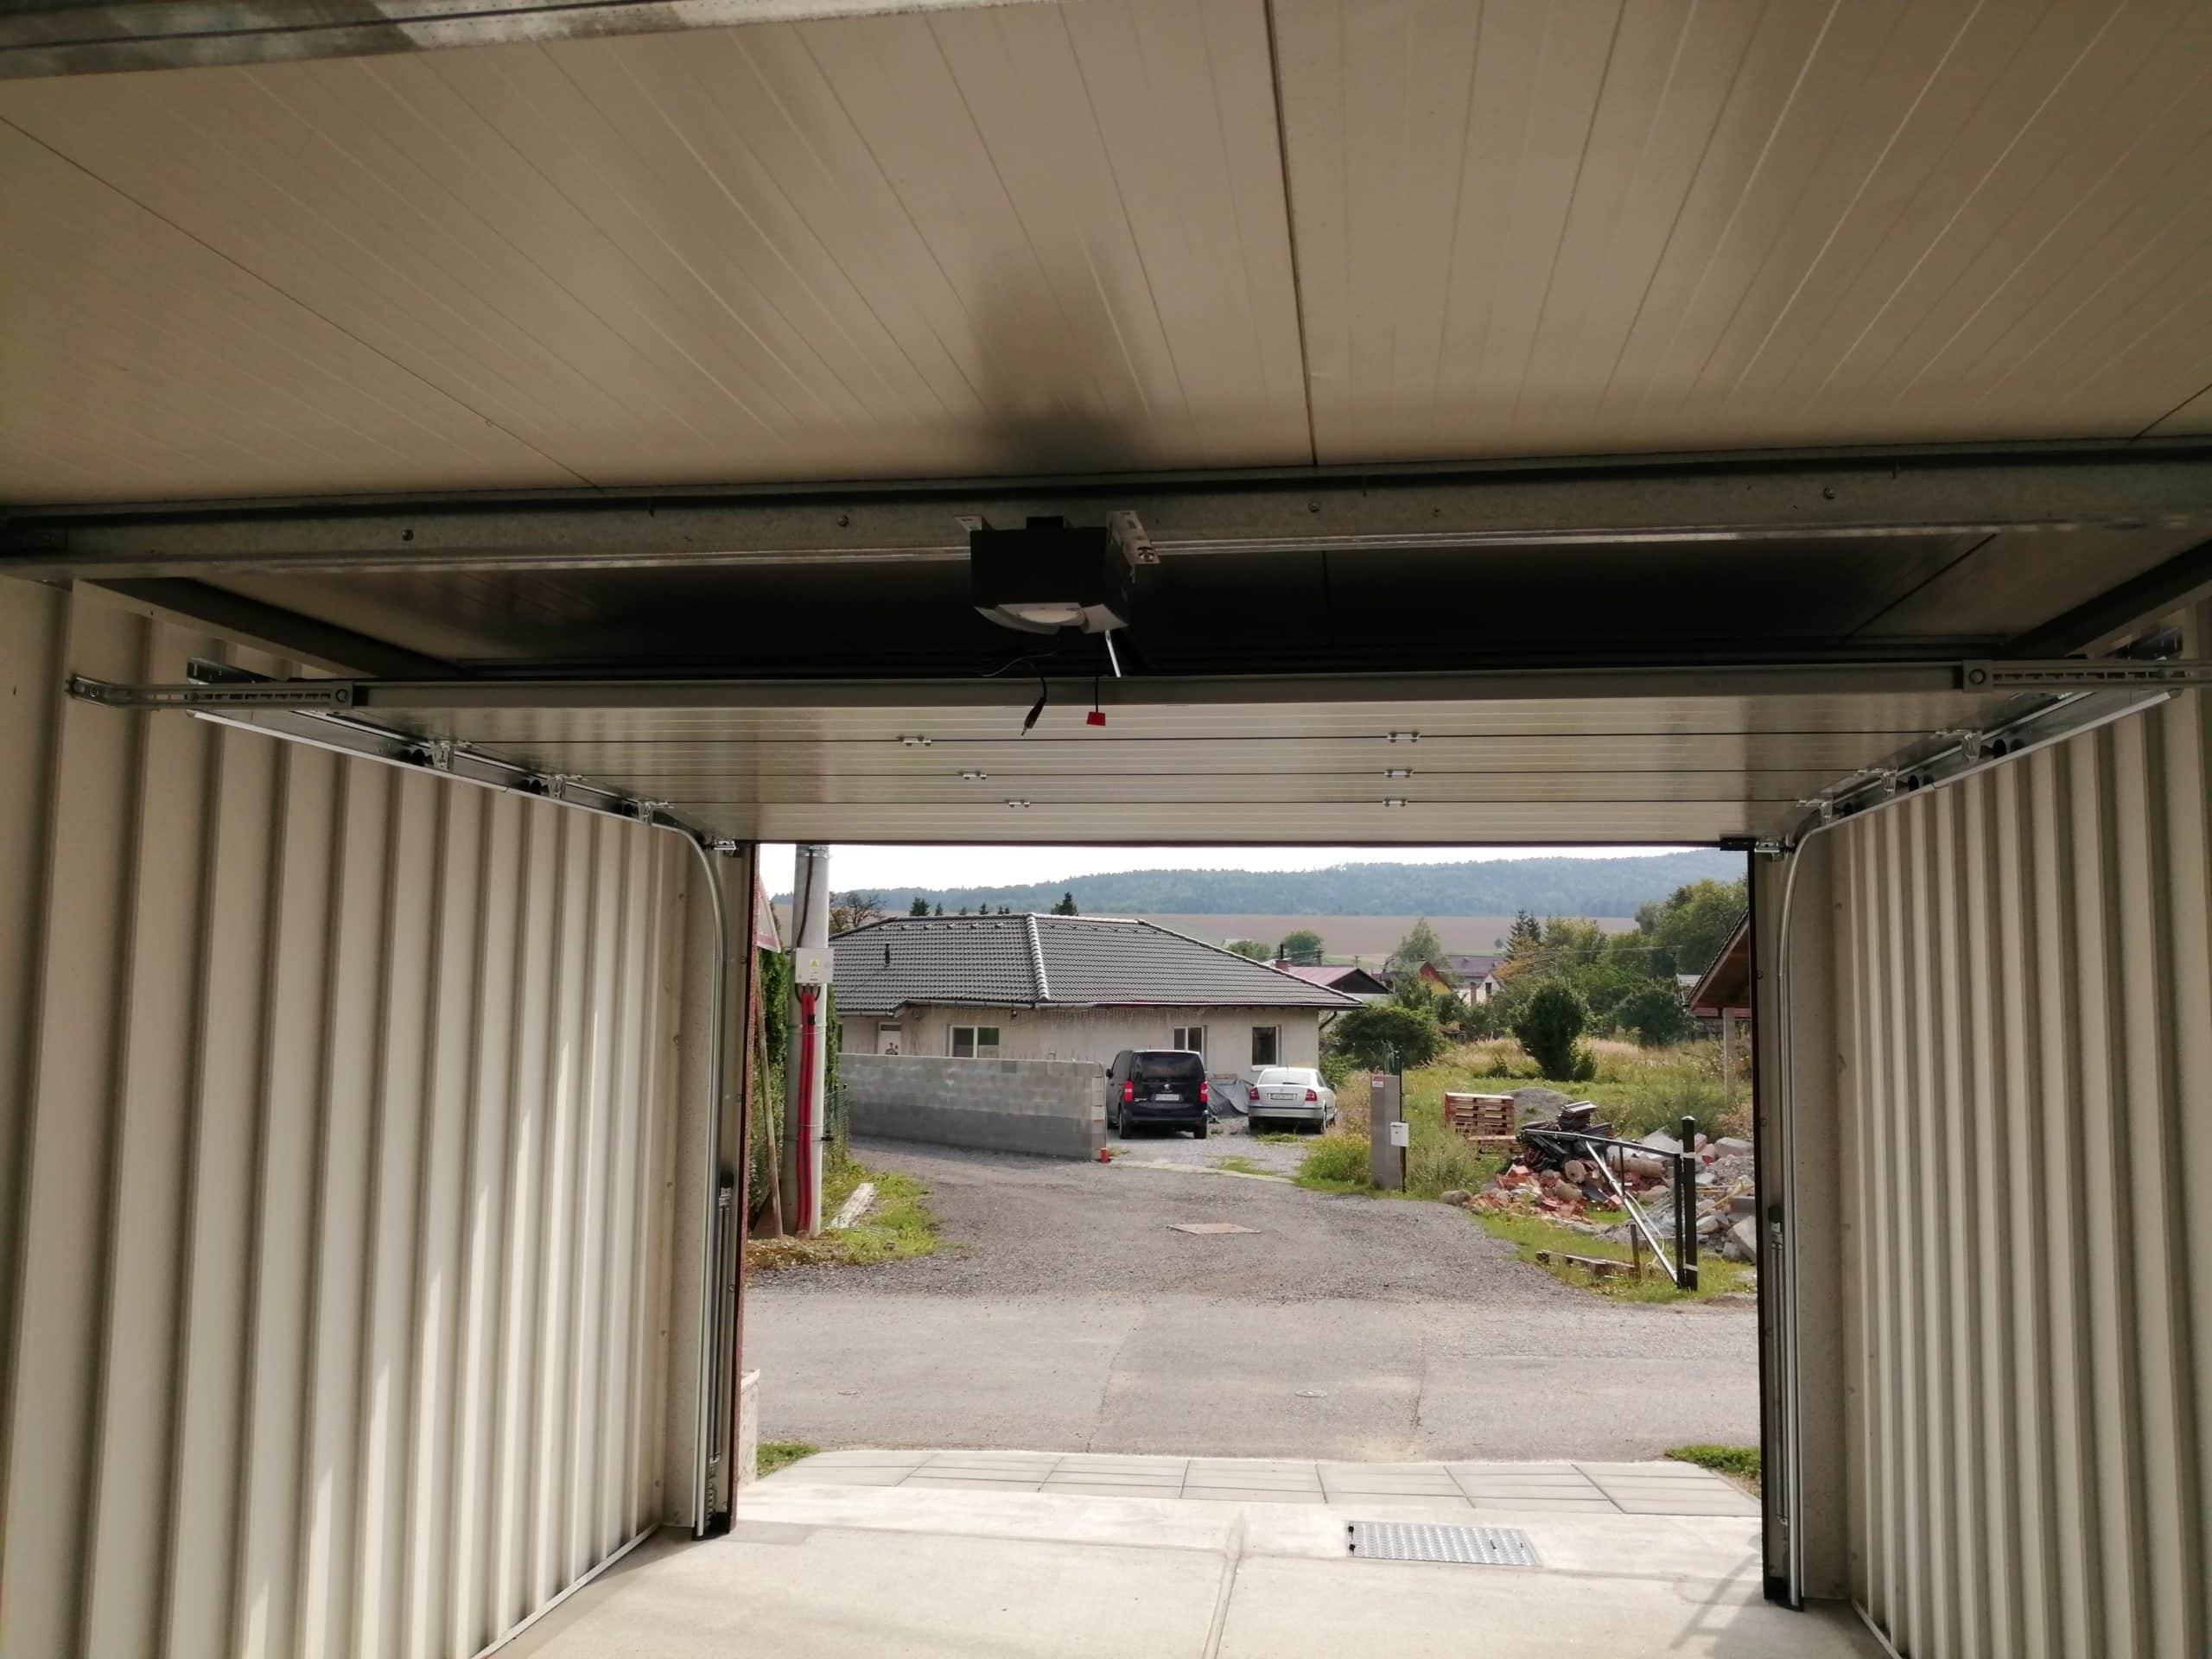 Výhľad na cestu z garáže